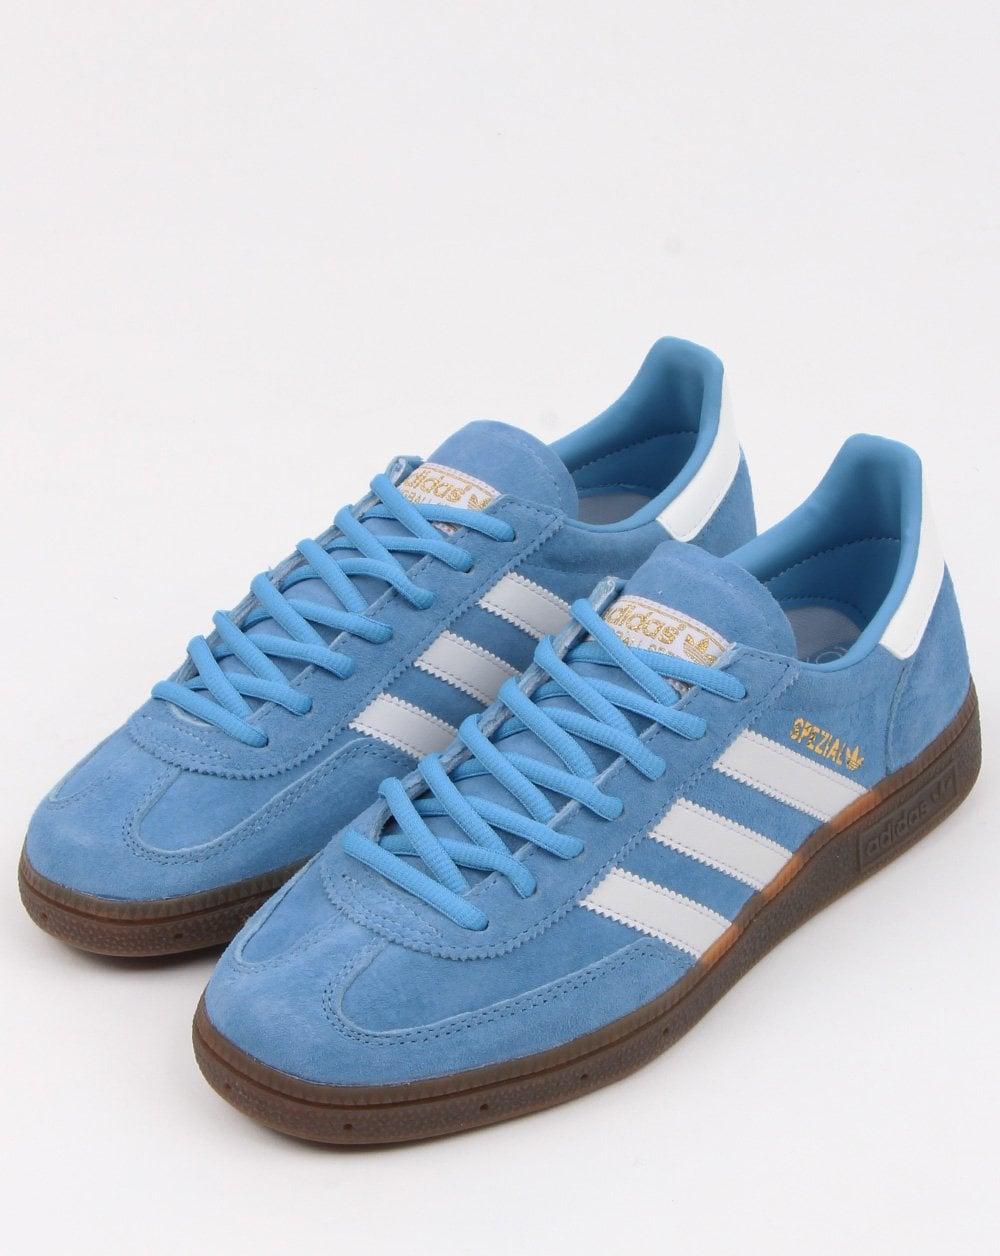 Adidas Spezial Trainers Sky Bluewhite